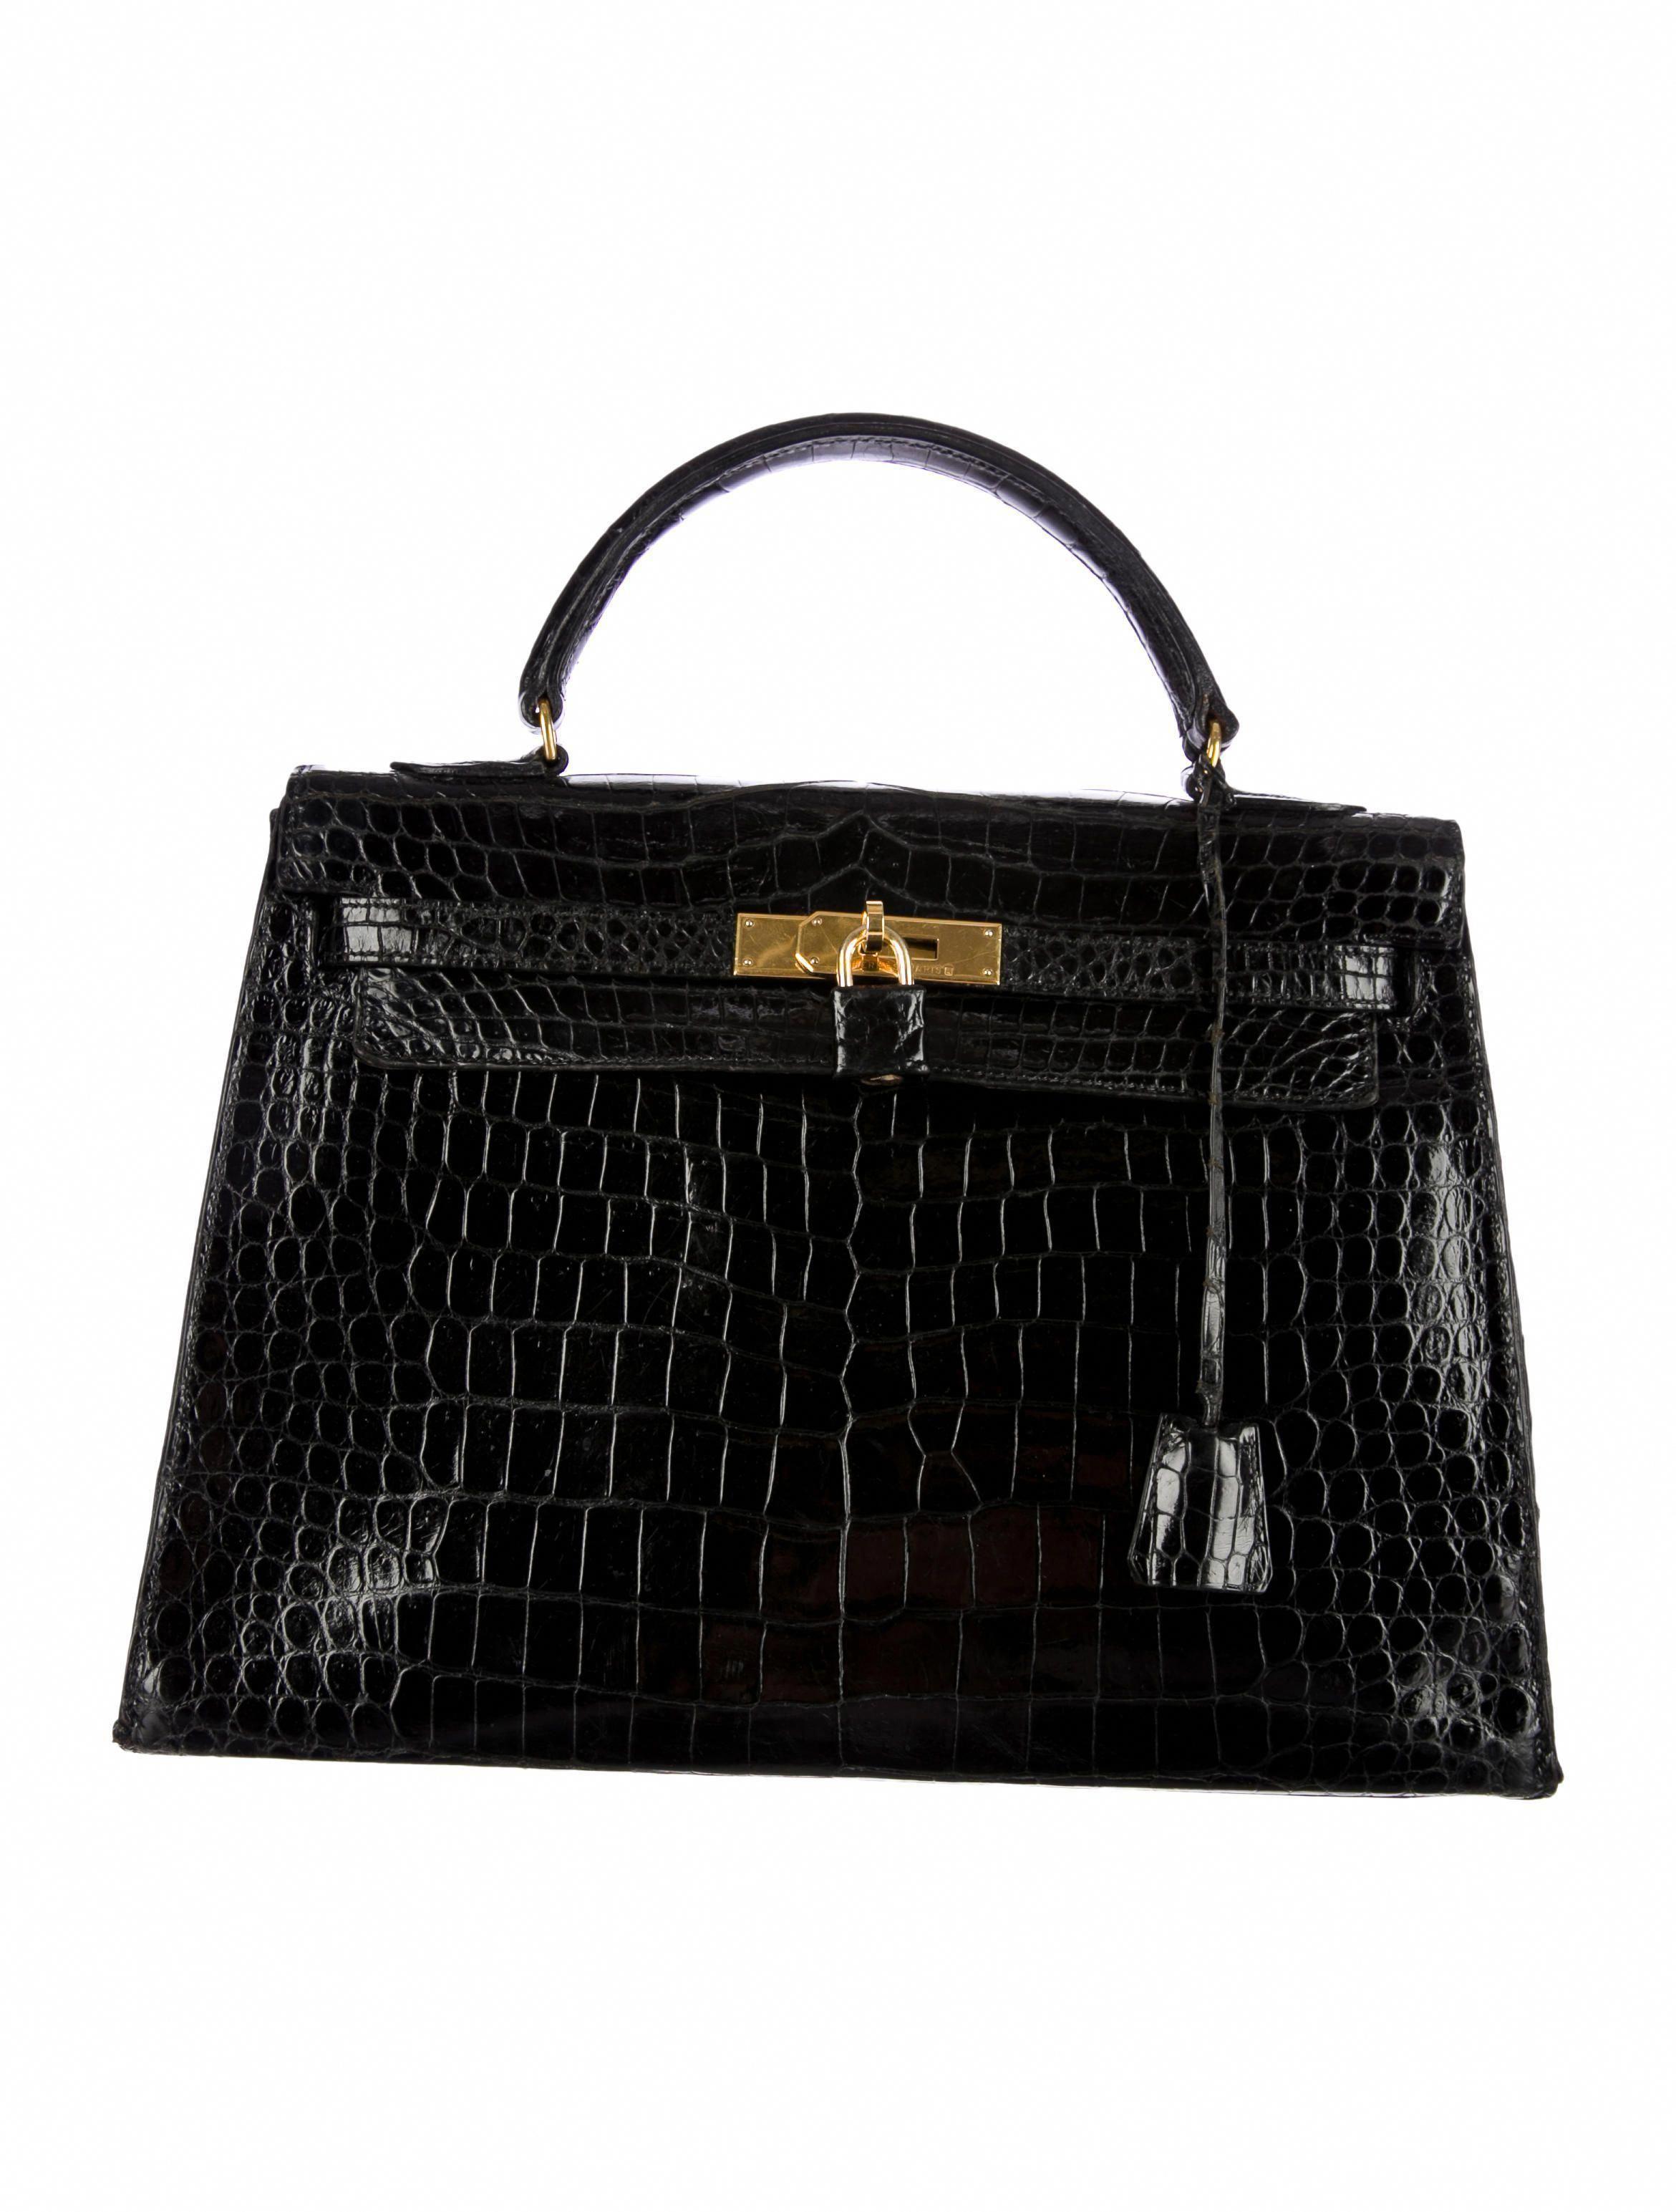 96bb898c6177 replica hermes handbags australia  Hermeshandbags